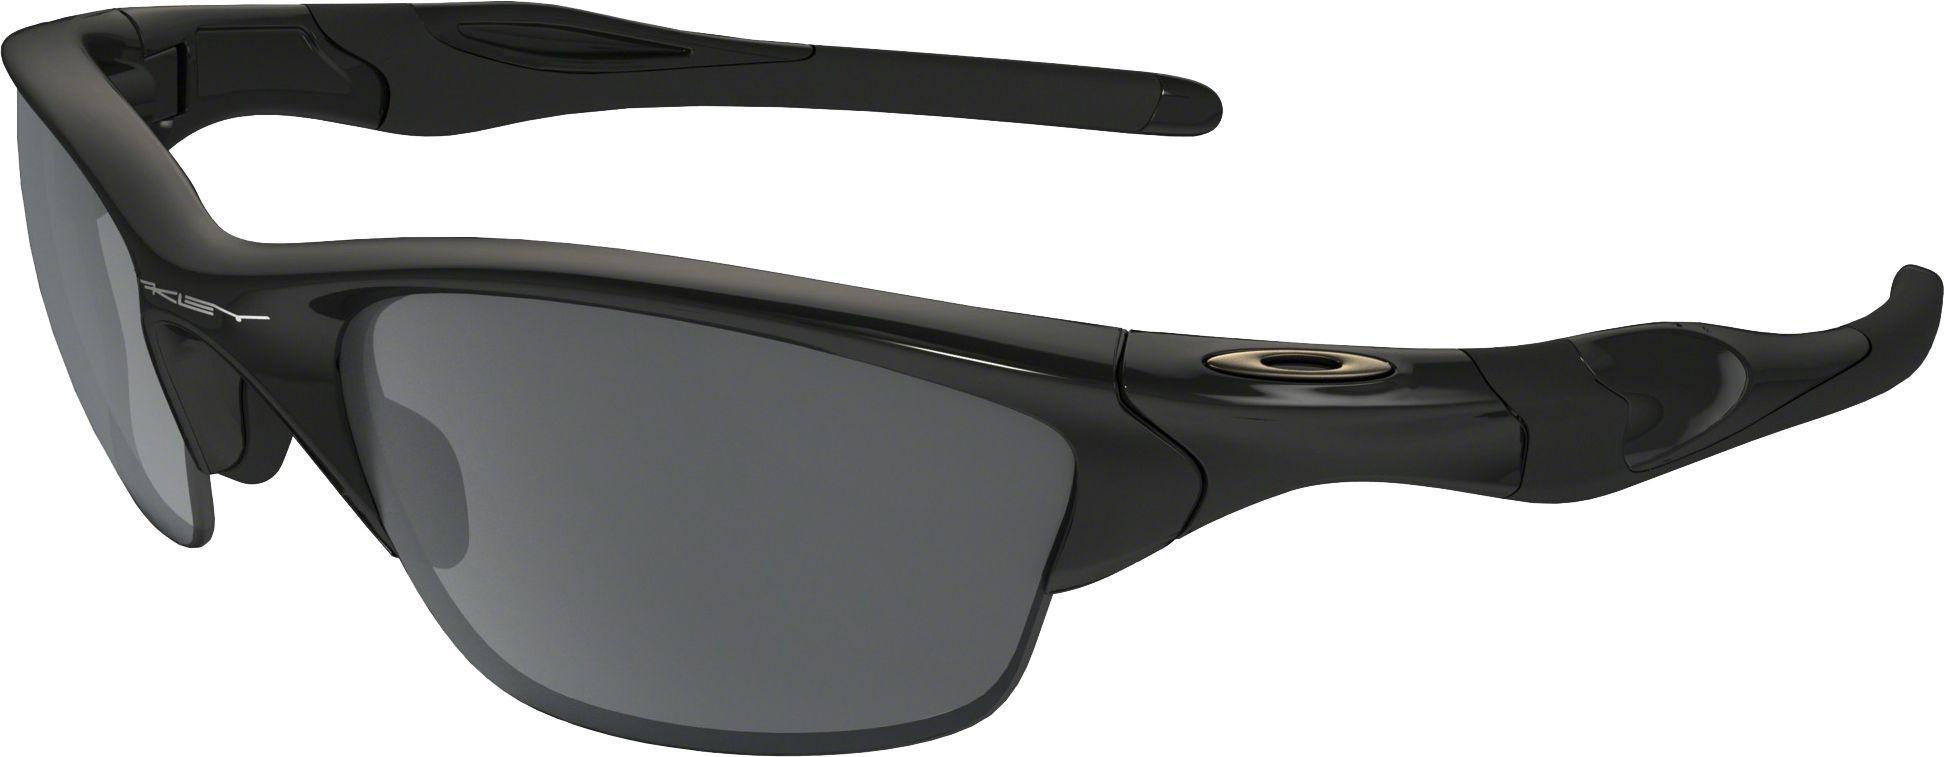 9830f7d151f Oakley. Men s Black Half Jacket 2.0 Sunglasses.  133 From Dick s Sporting  Goods